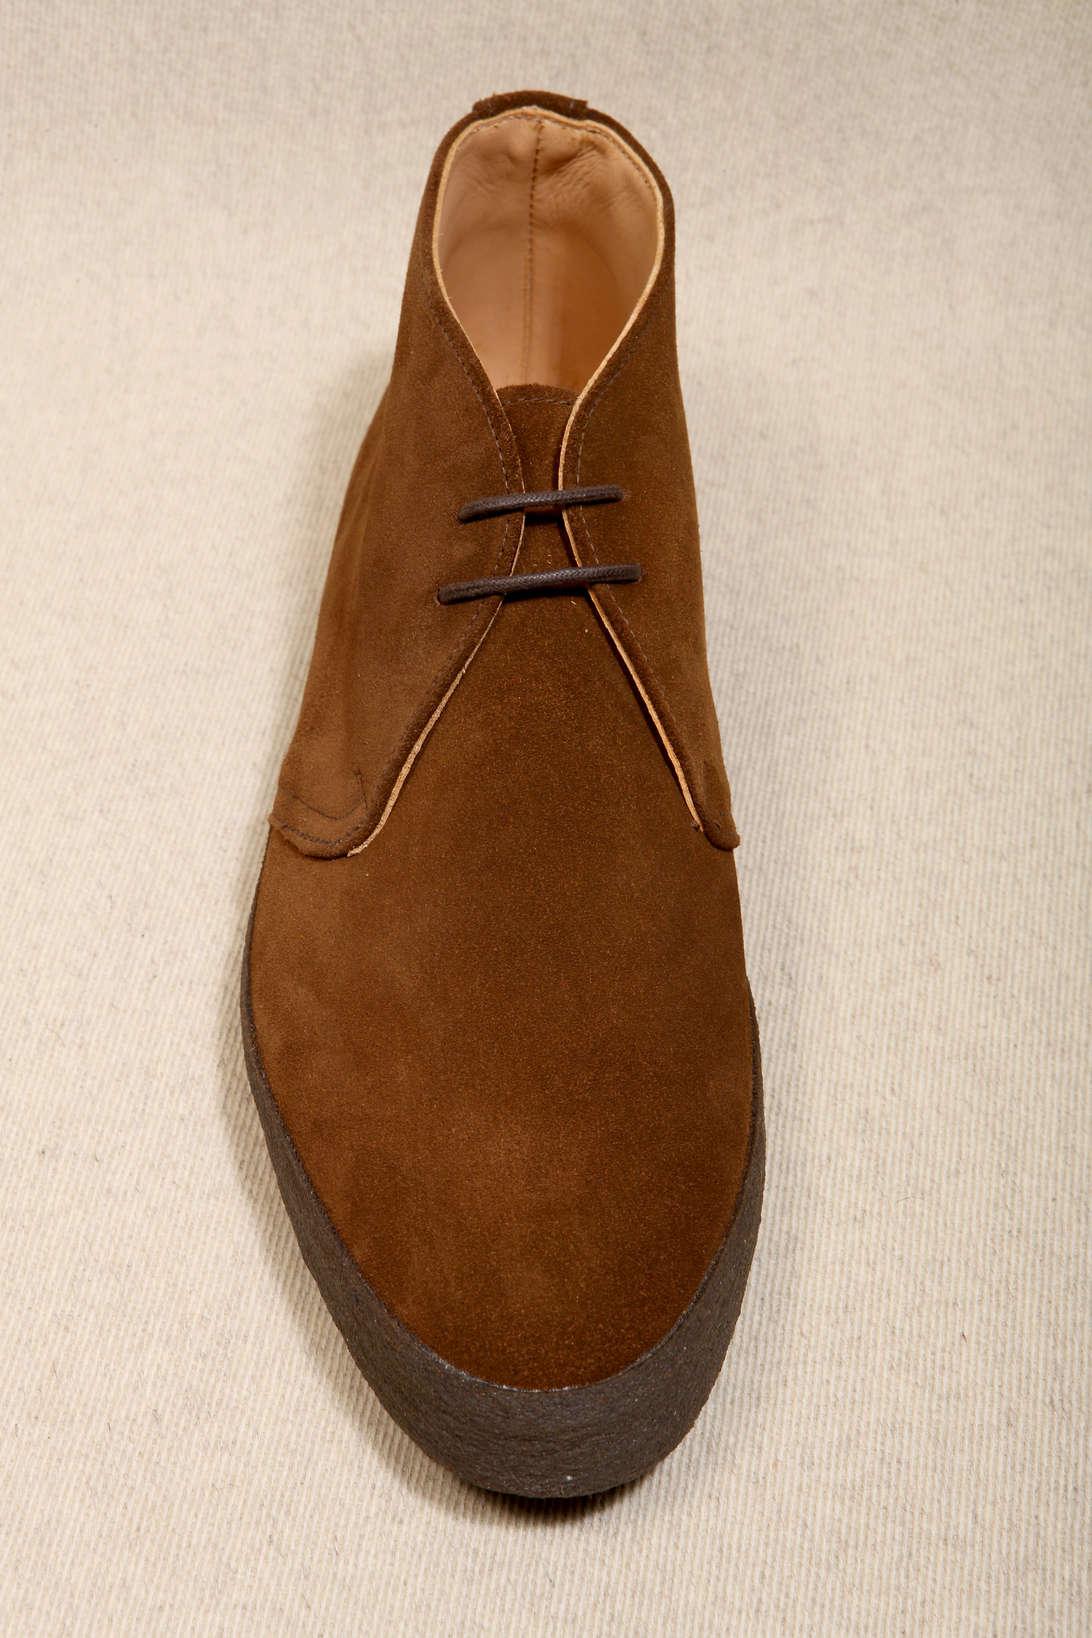 Sanders-playboy-boots-chaussures-Steve-mcqueen-4-lecatalog.com